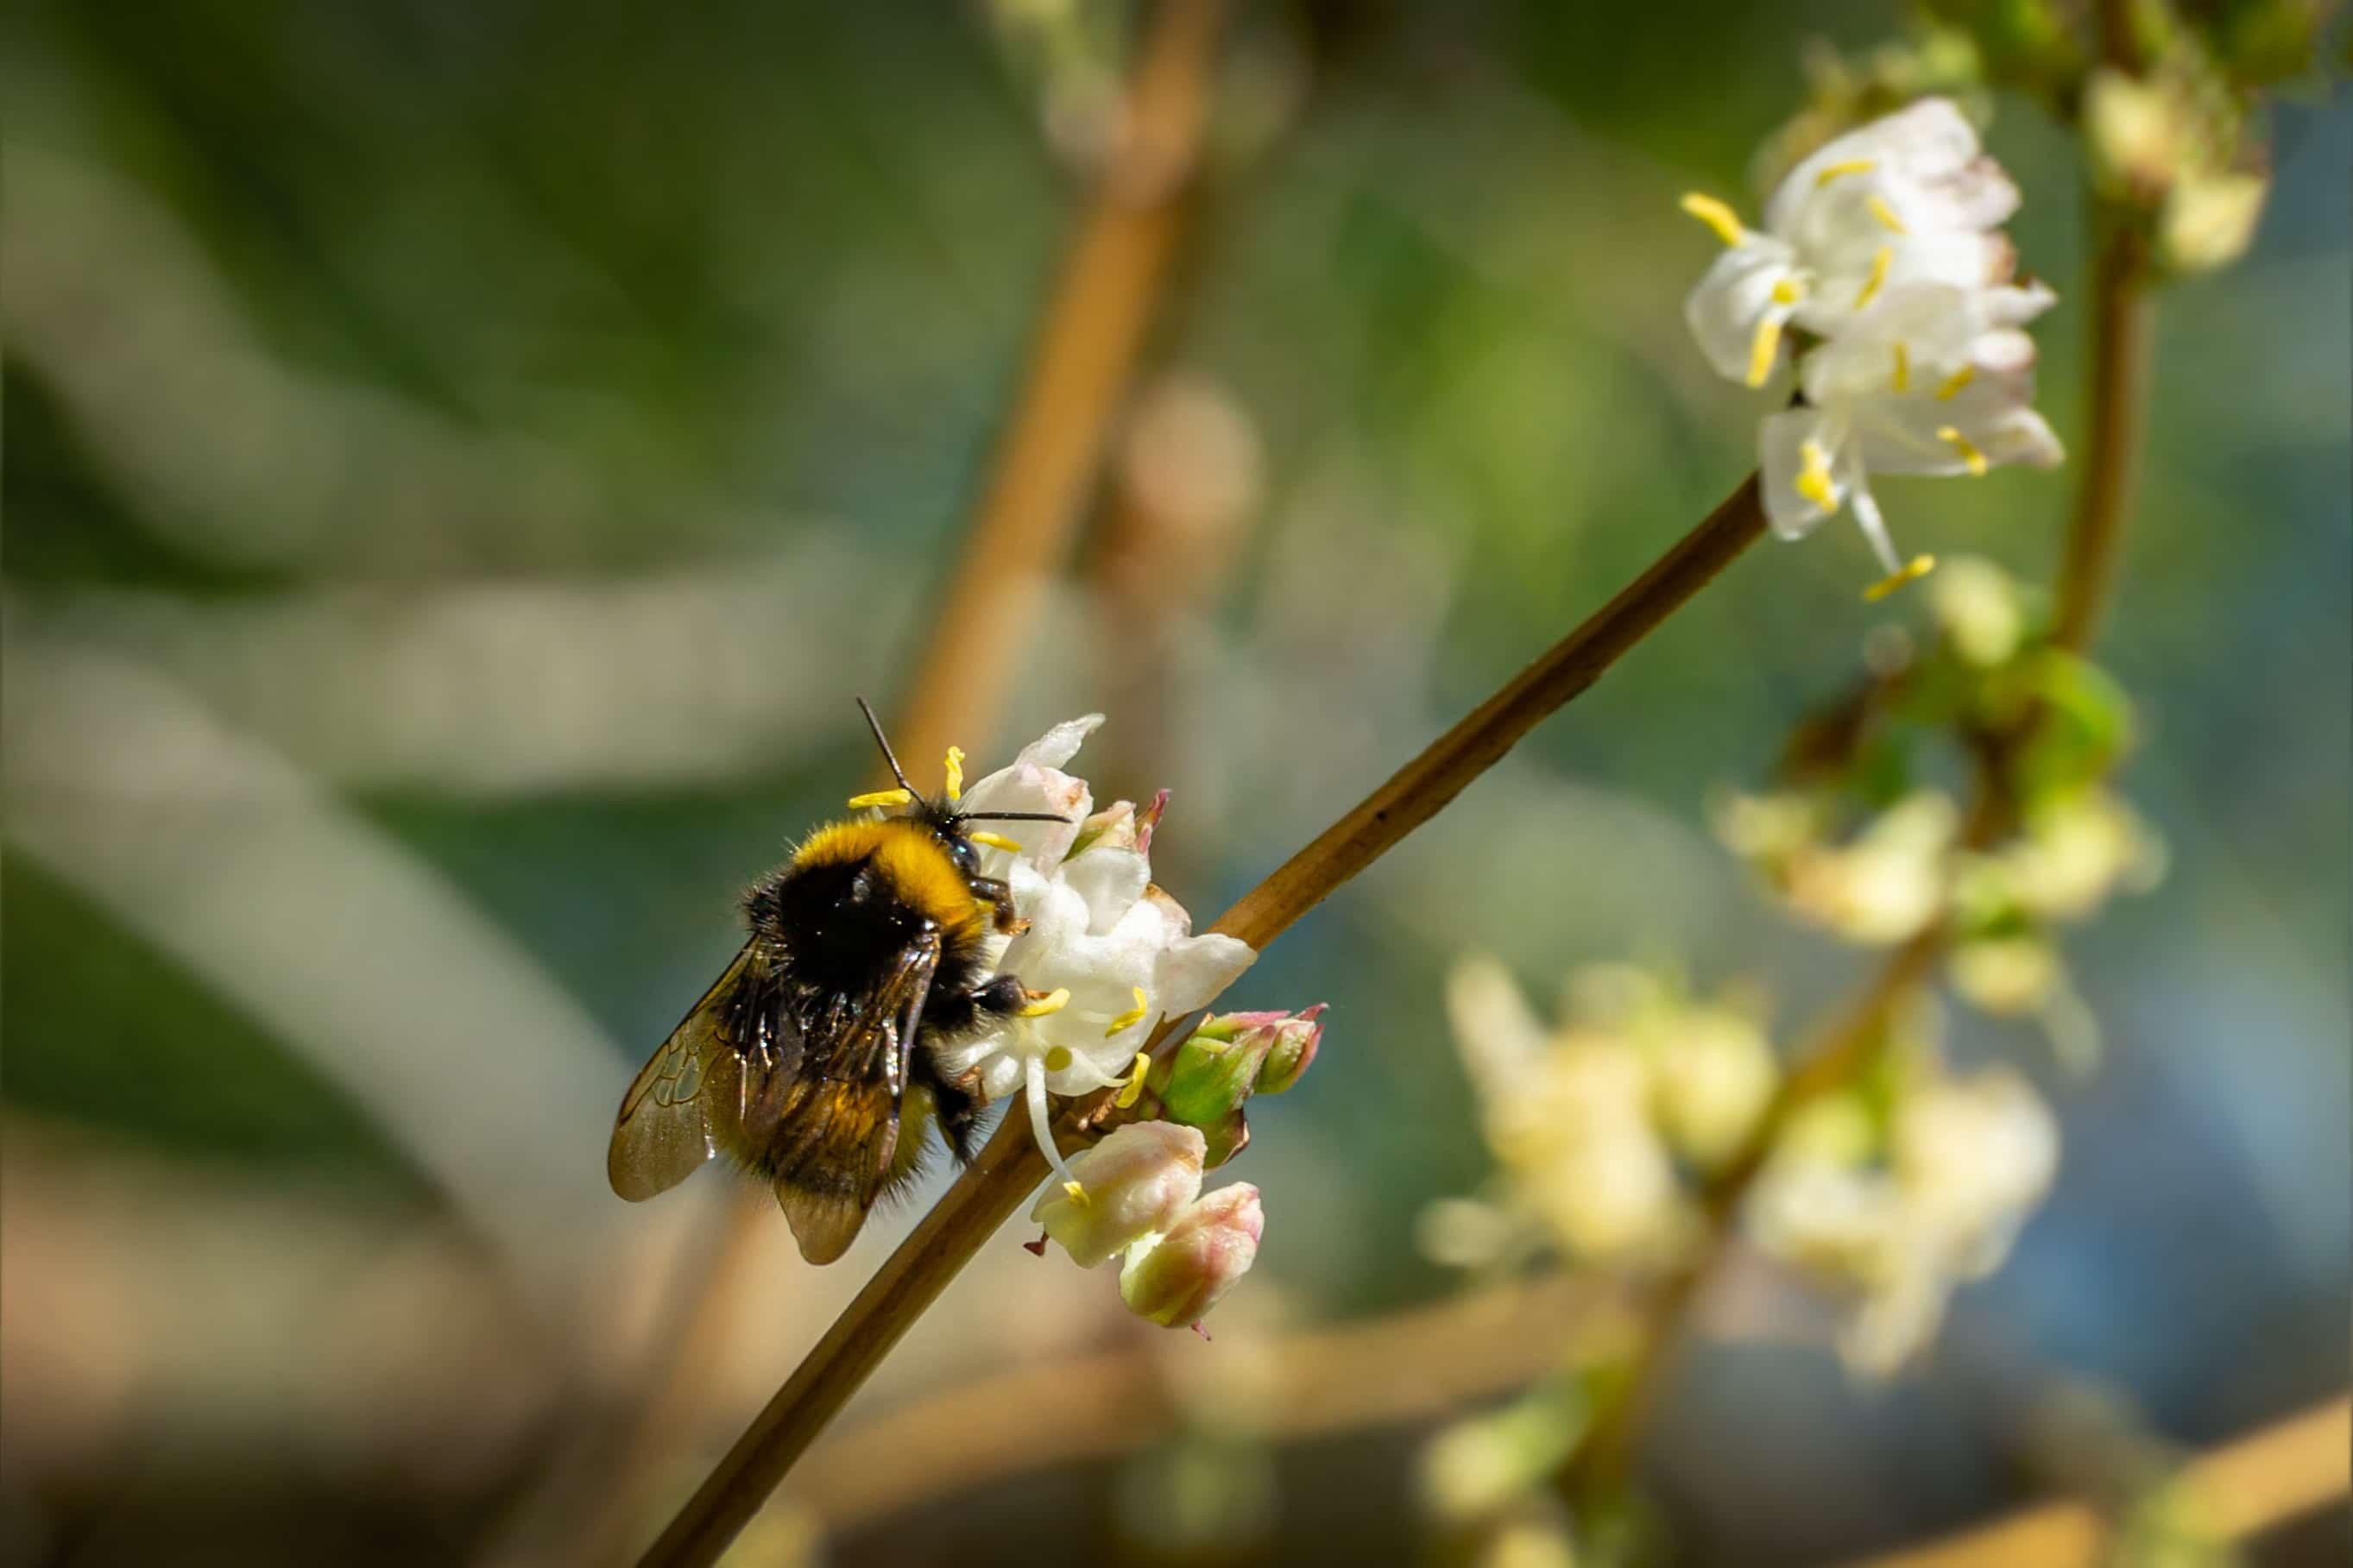 Close-up of garden bumblebee (Bombus hortorum) collecting nectar from blooming white flower winter honeysuckle Lonicera fragrantissima (standishii). January jasmine on natural bokeh background